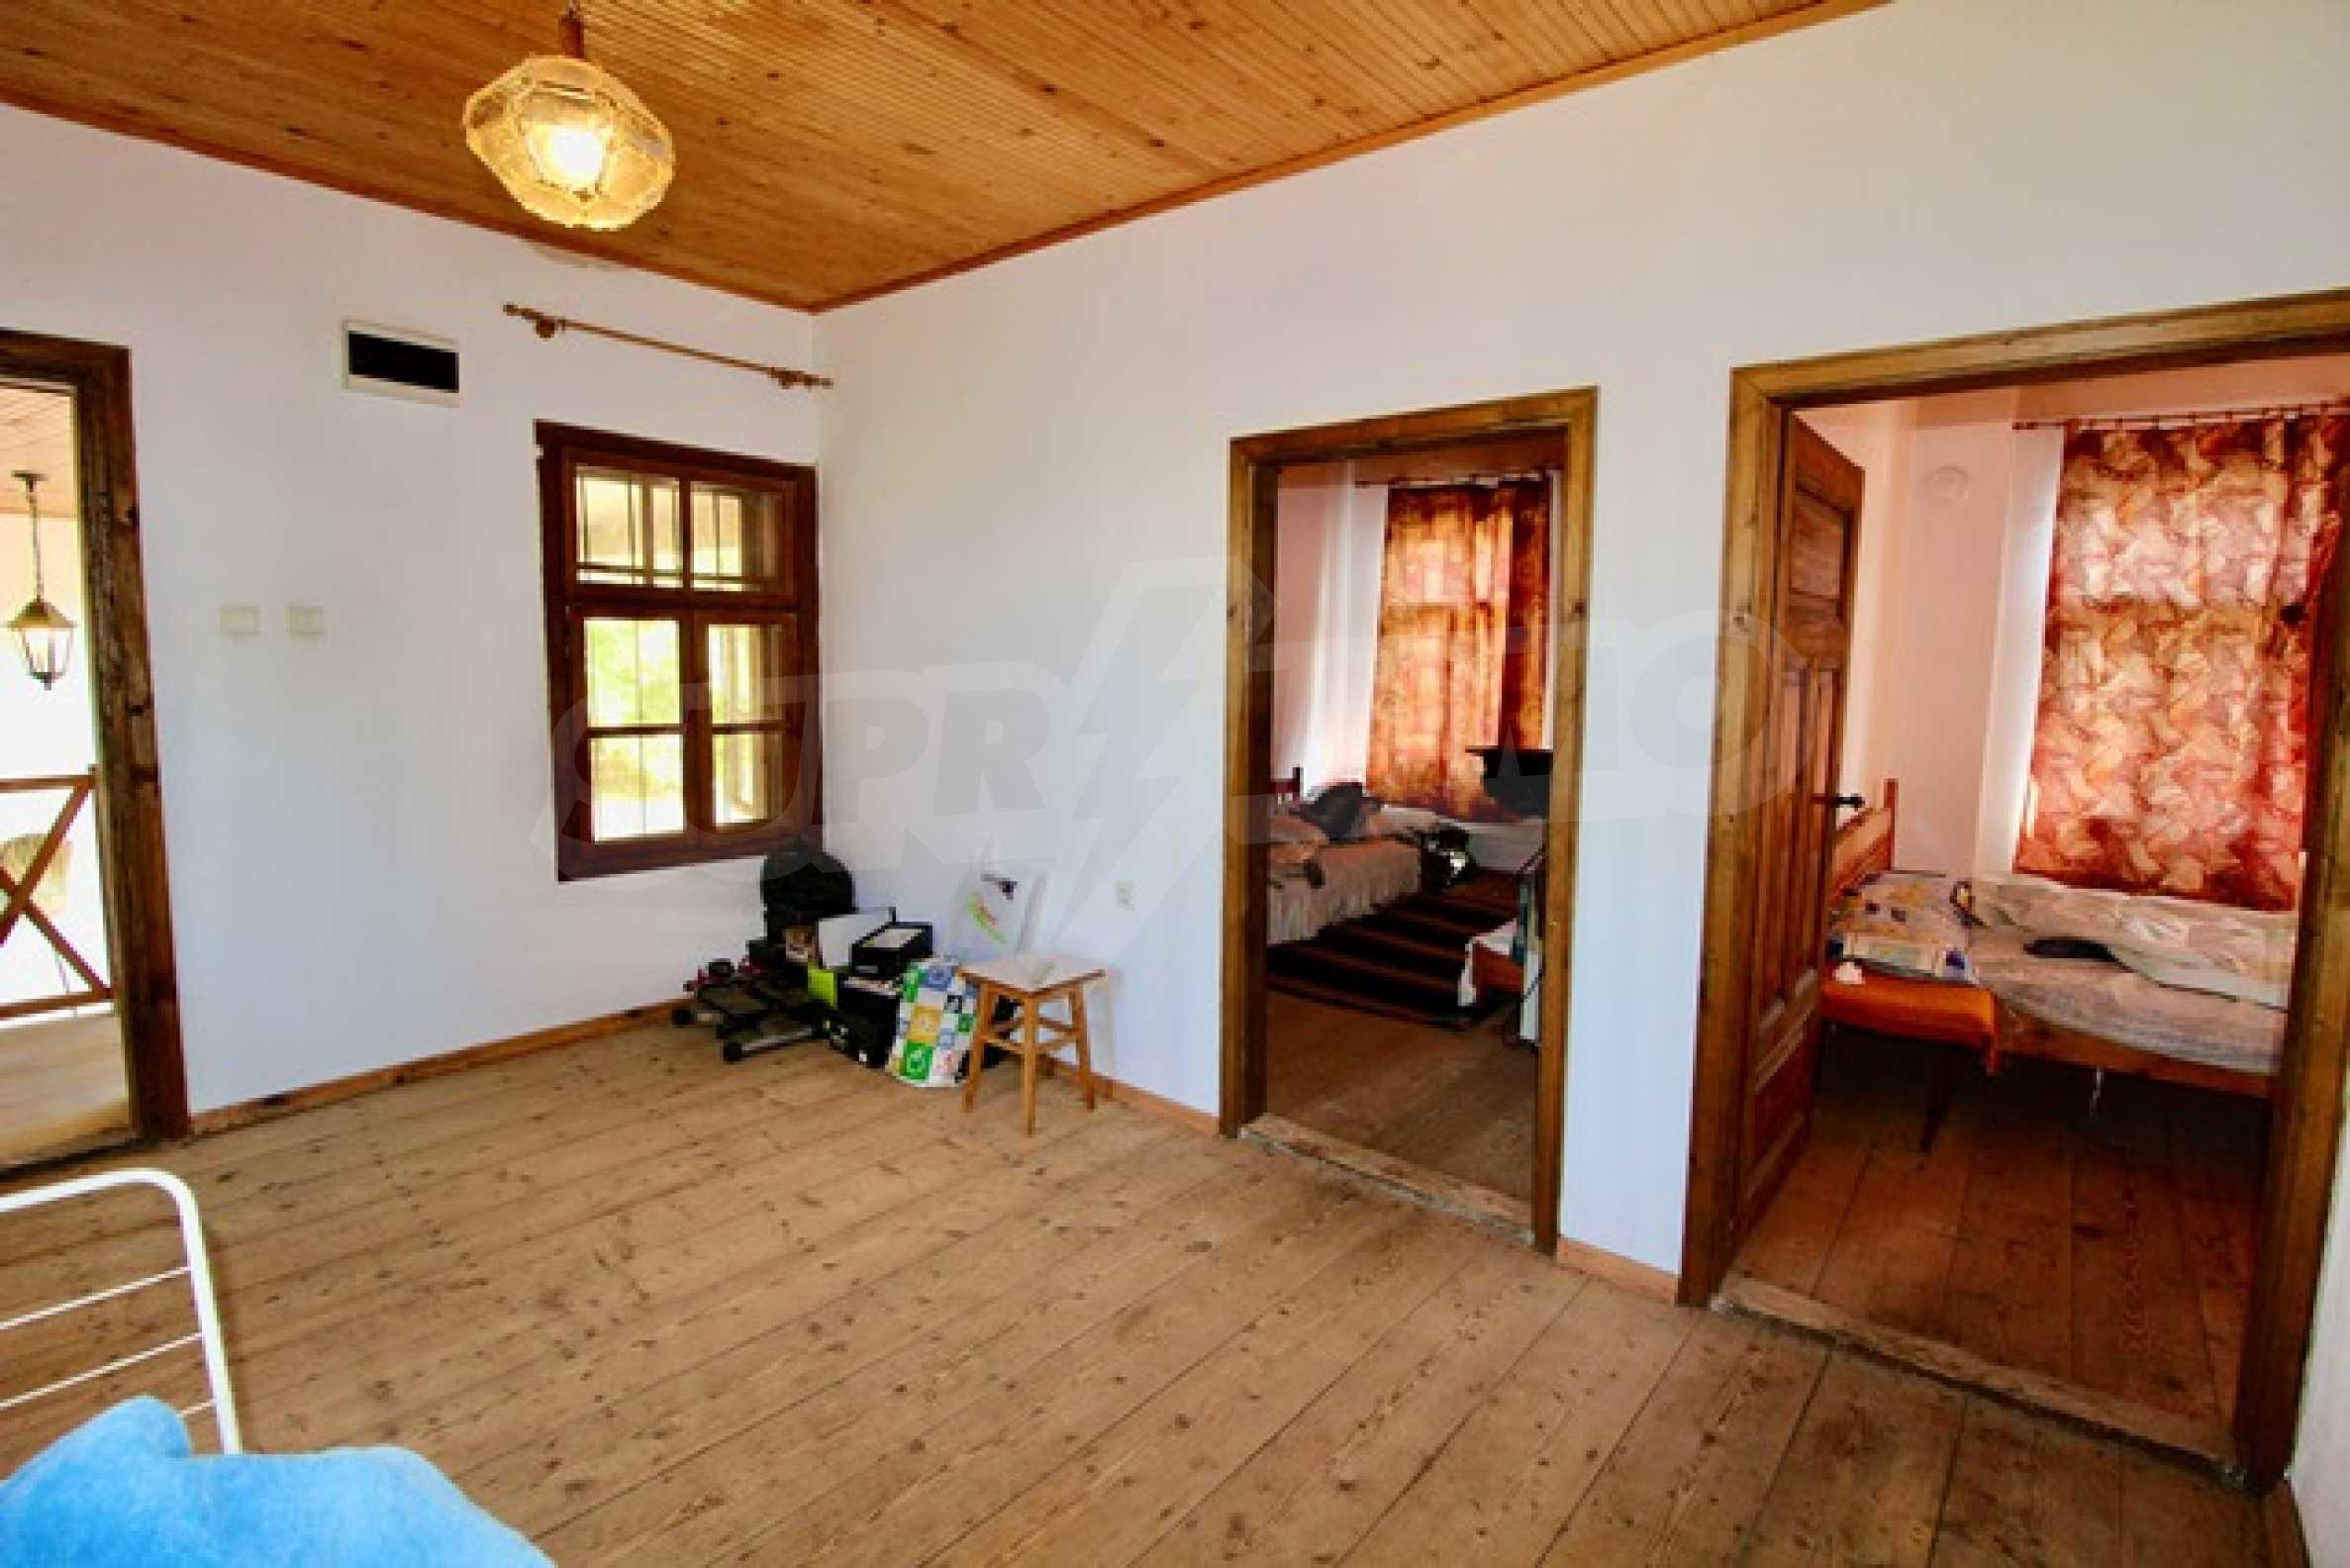 Lovely old house just 17 km away from Veliko Tarnovo 8